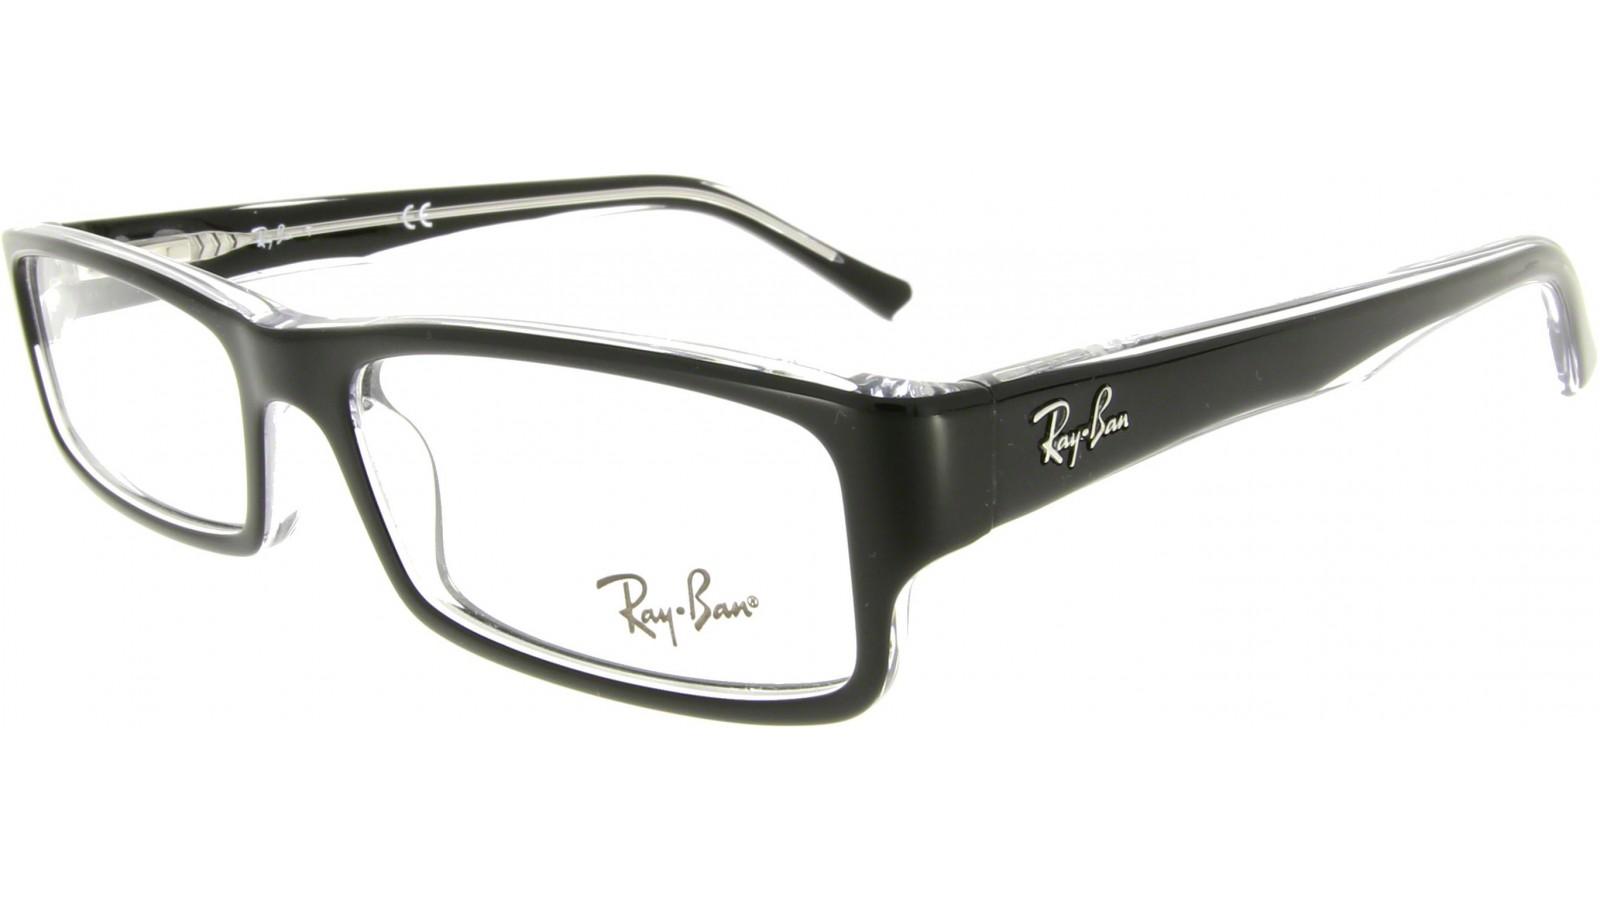 ray ban brille rx 5246 weiß